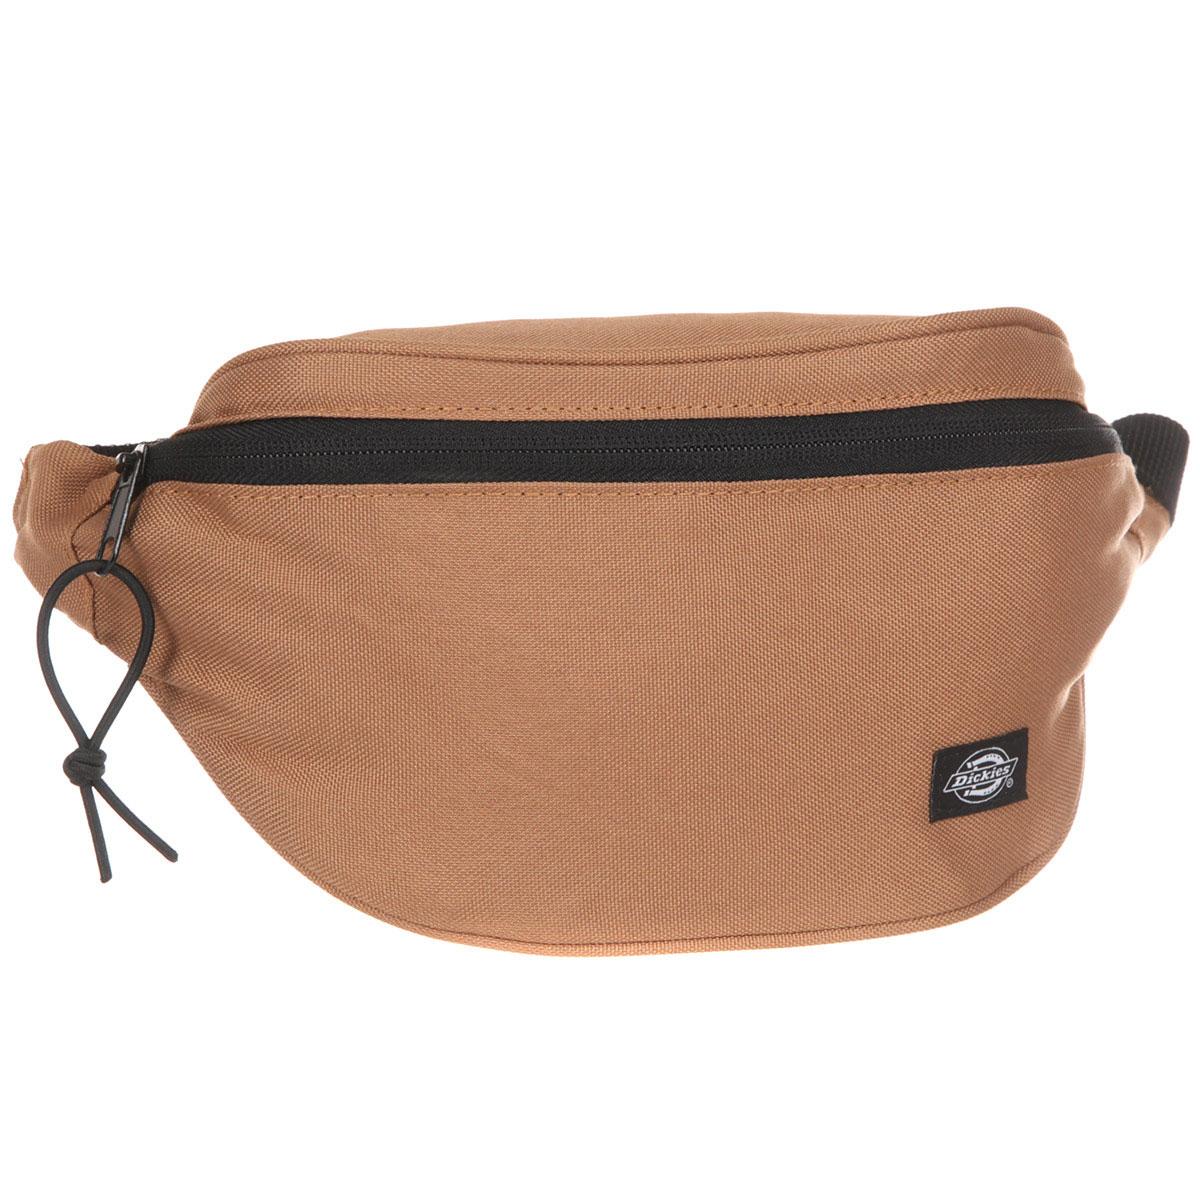 00be20128075 Купить сумку поясная Dickies High Island Brown Duck в интернет ...